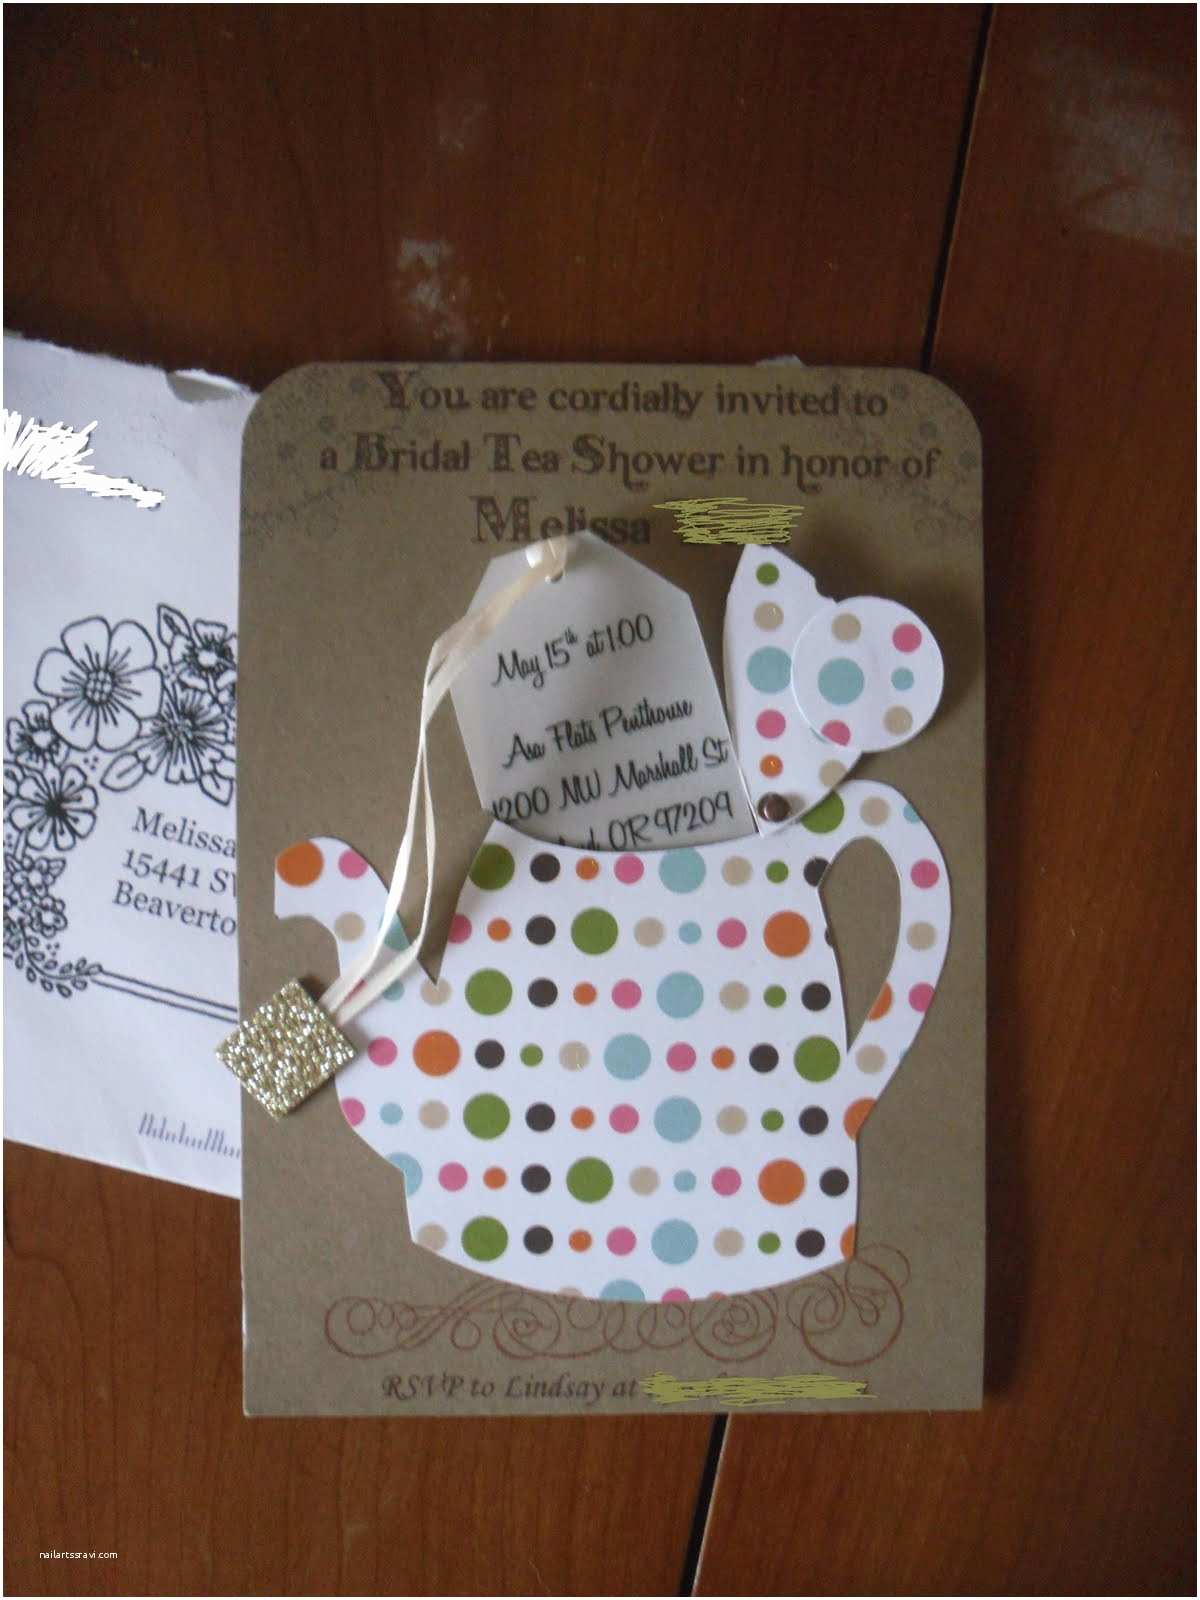 Bridal Shower Tea Party Invitations the tortoise A Tea Party